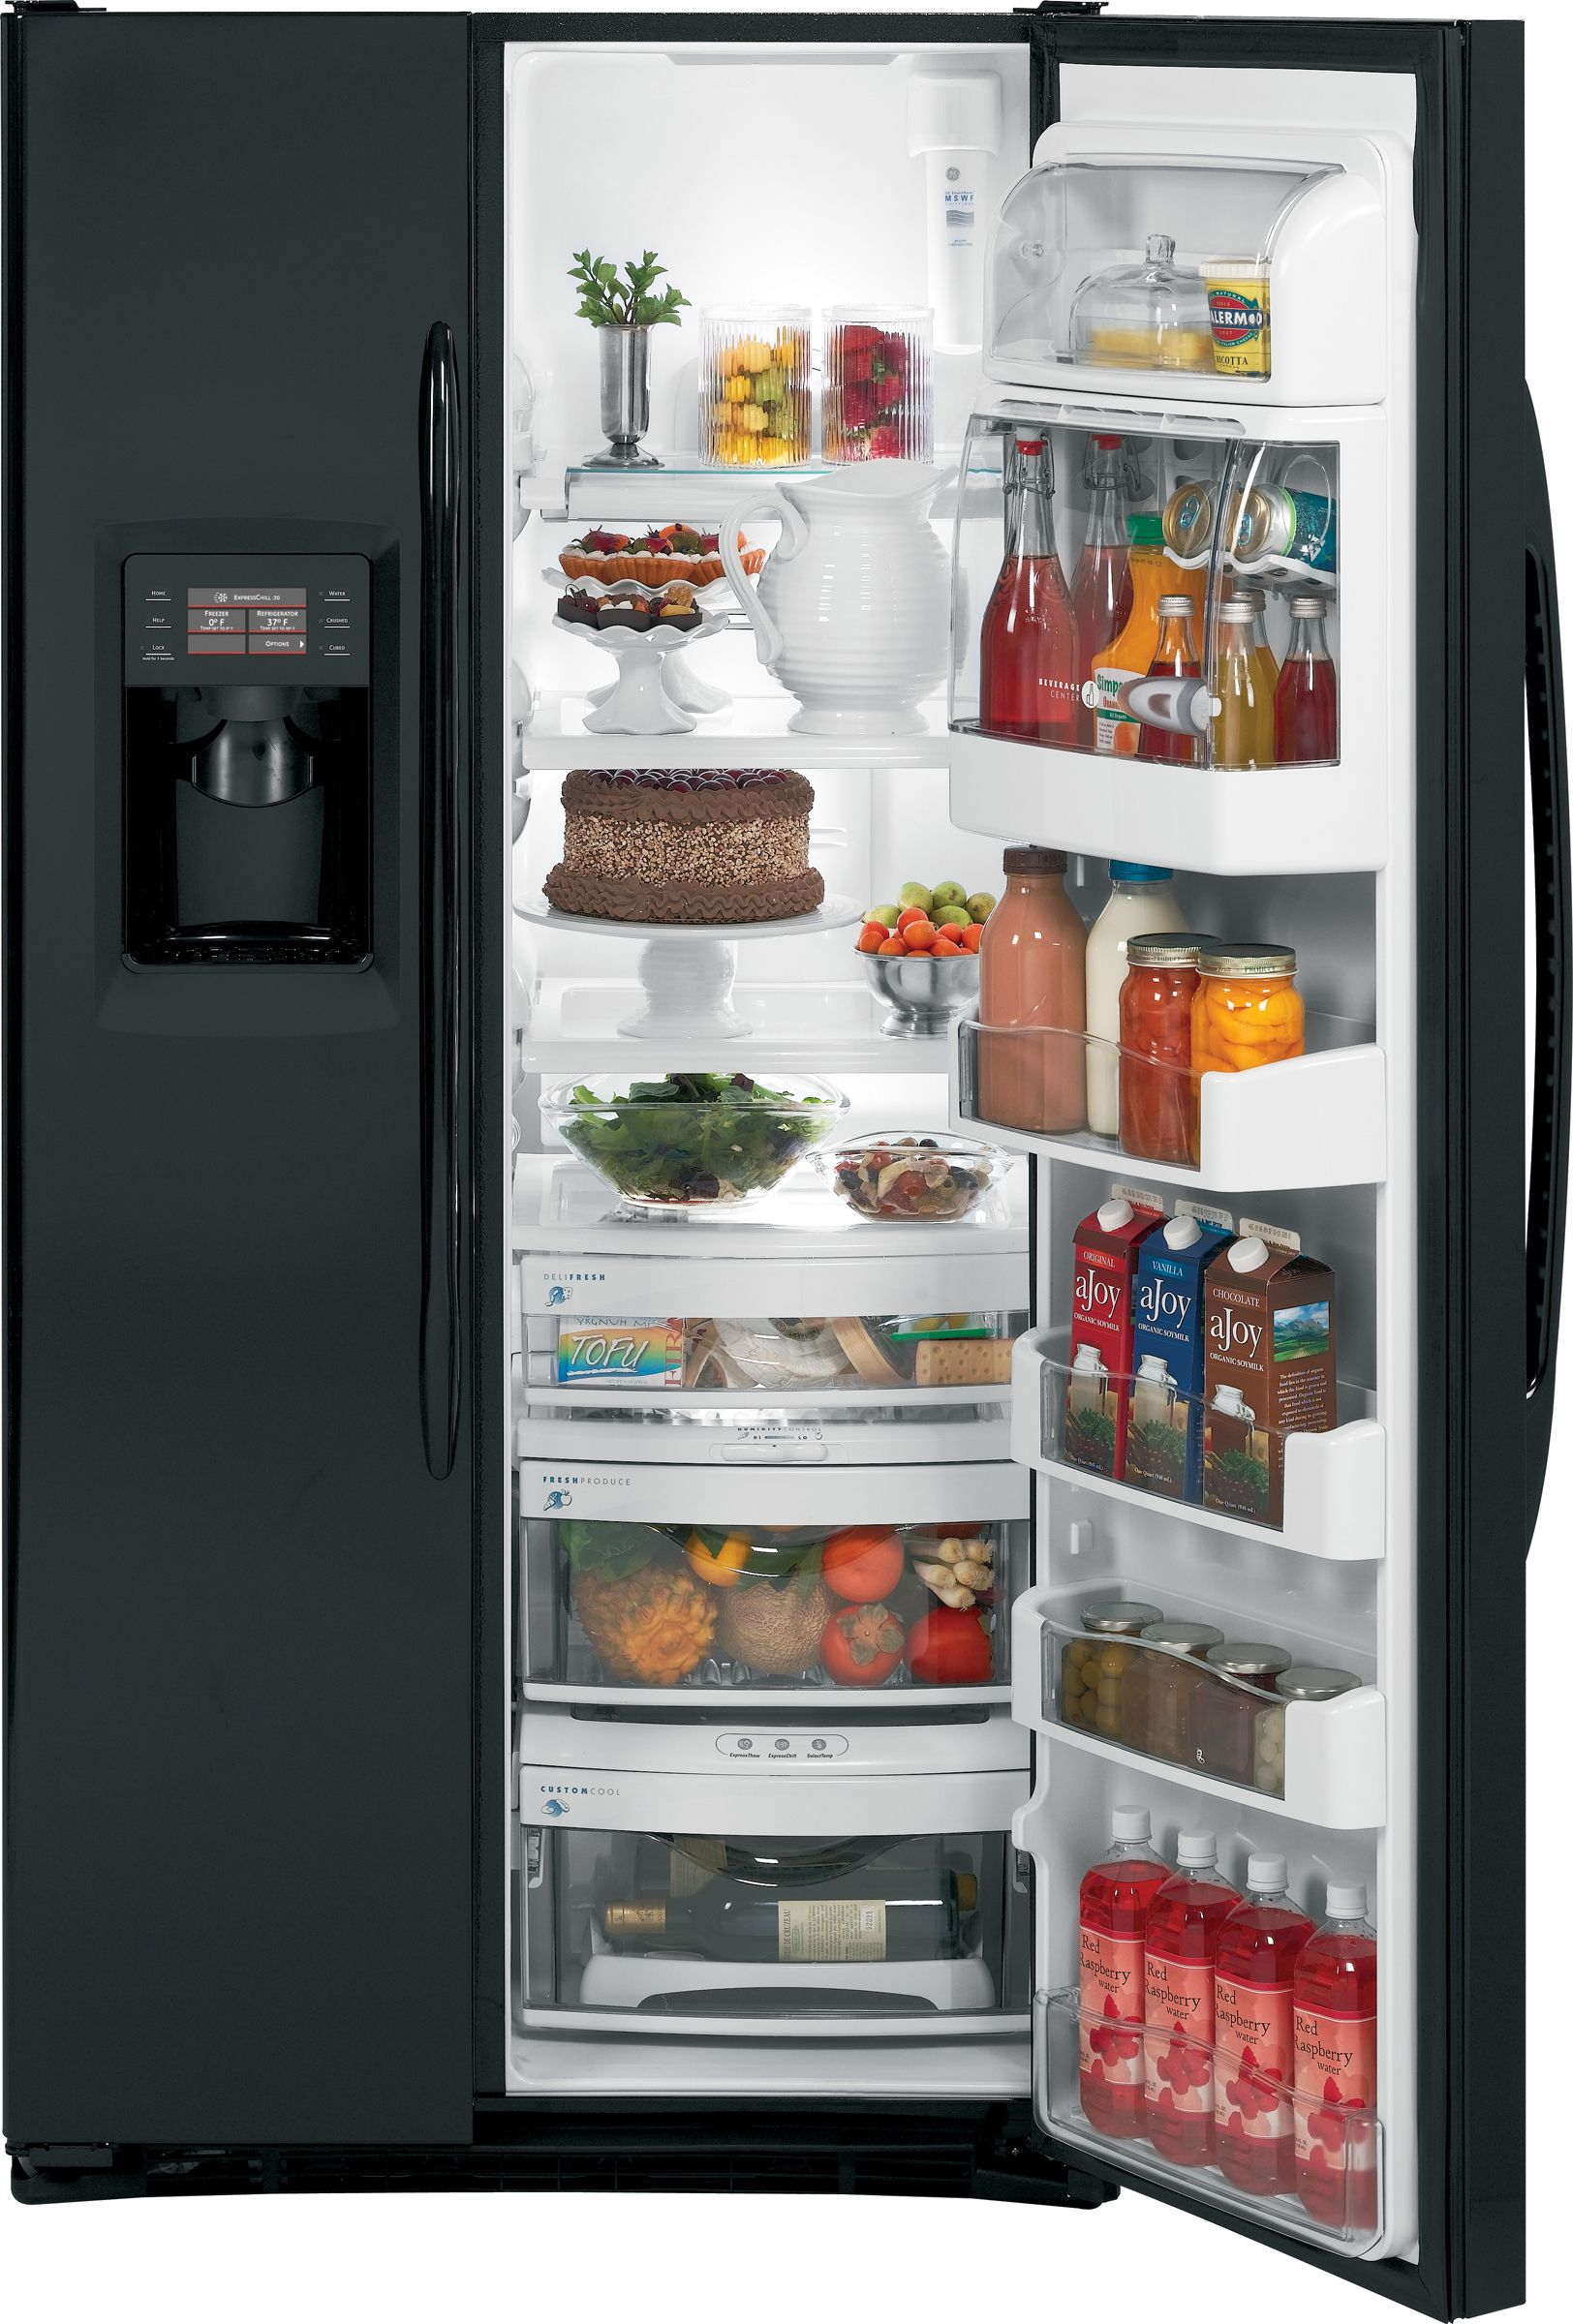 GE 24.6 cu. ft. Counter Depth Side-By-Side Refrigerator